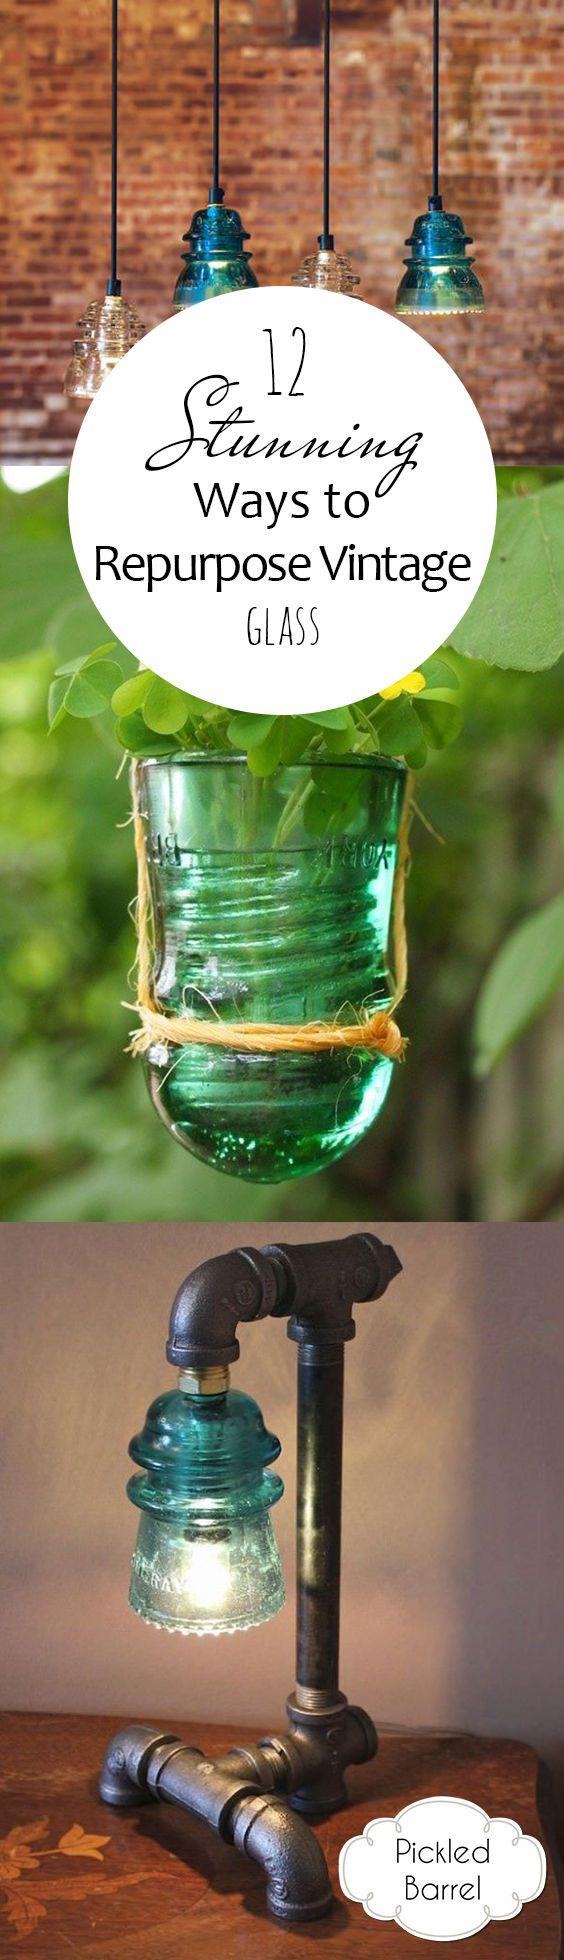 12 Stunning Ways to Repurpose Vintage Glass